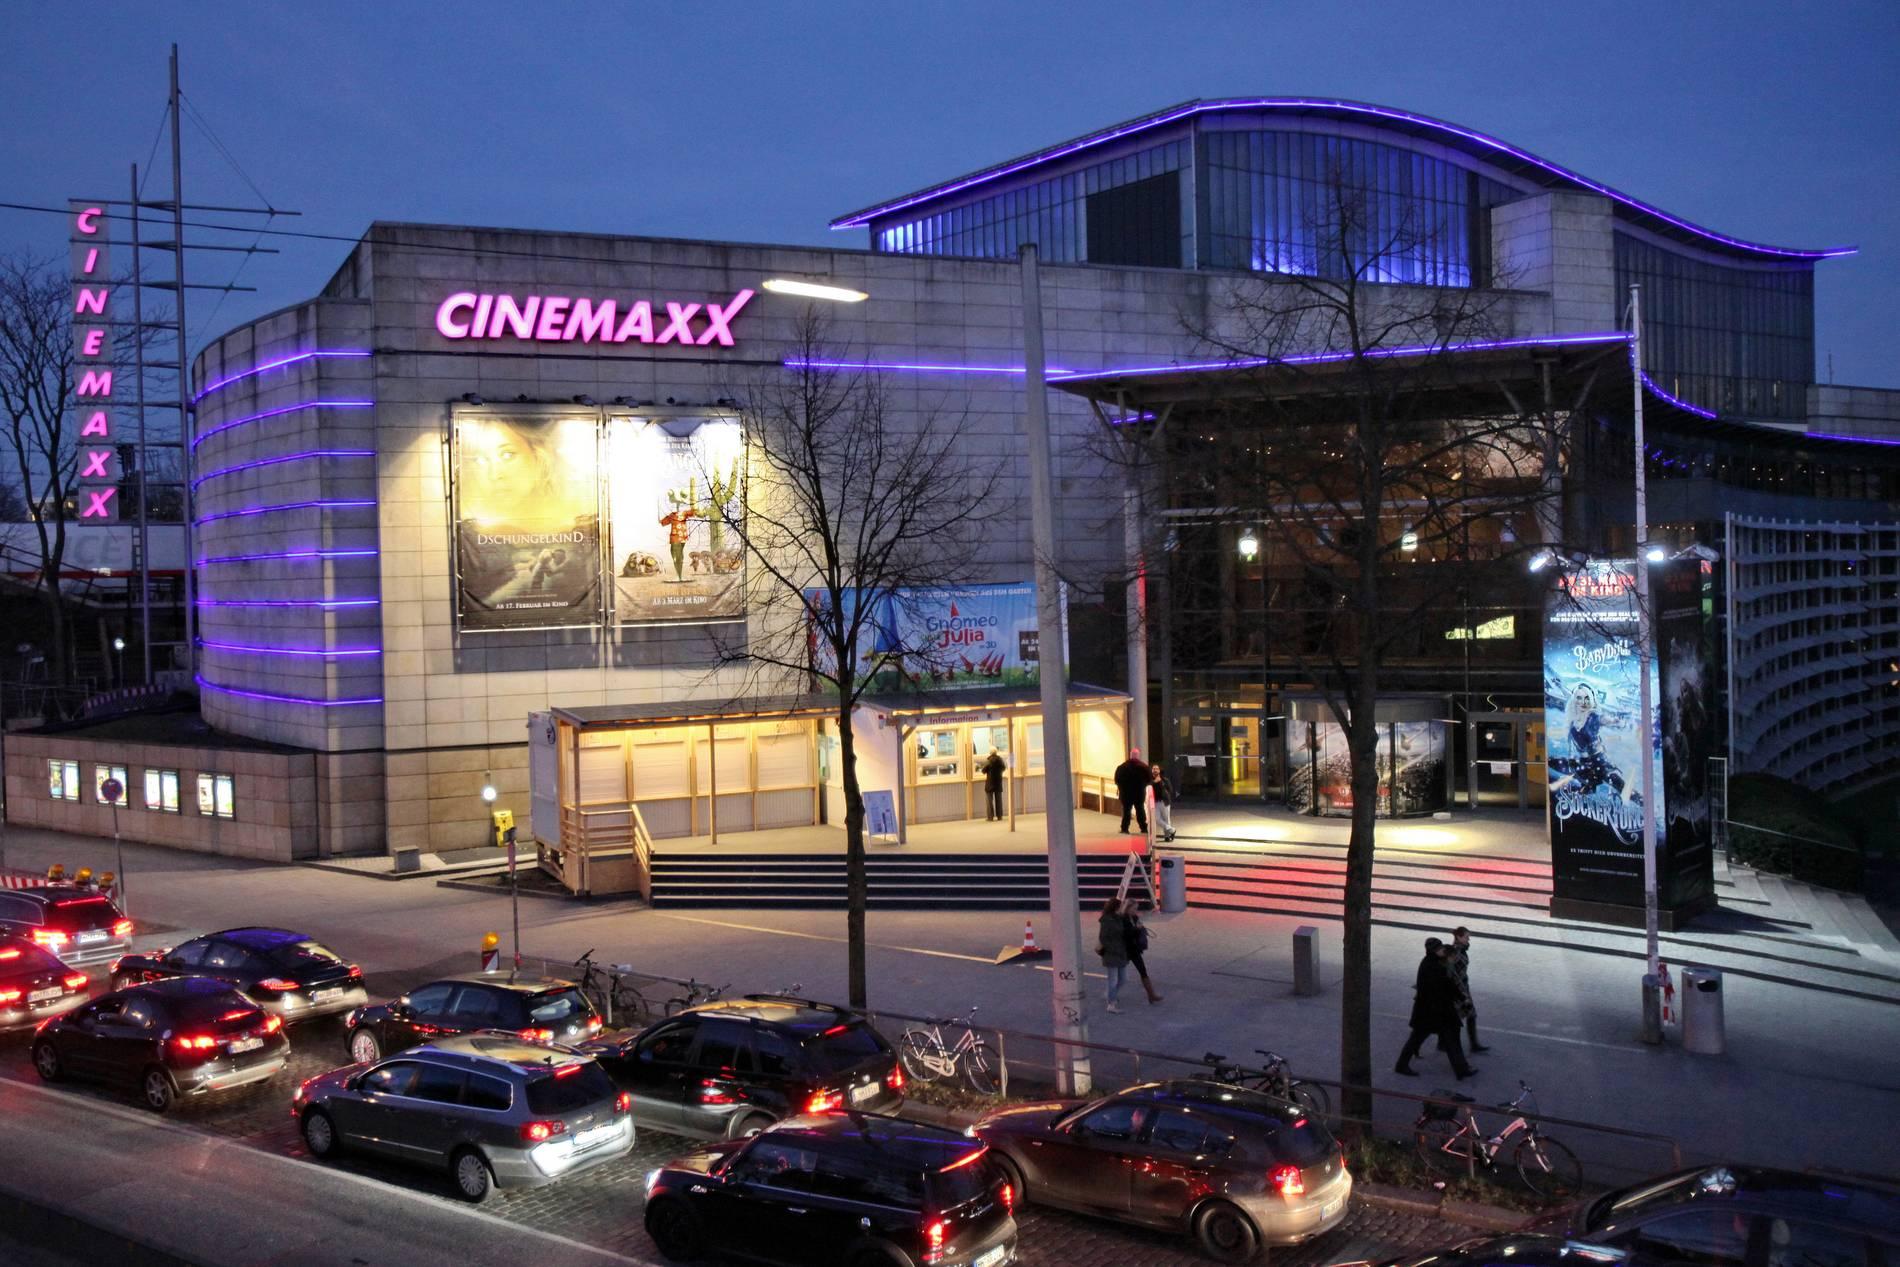 Wuppertal Kino Cinemaxx